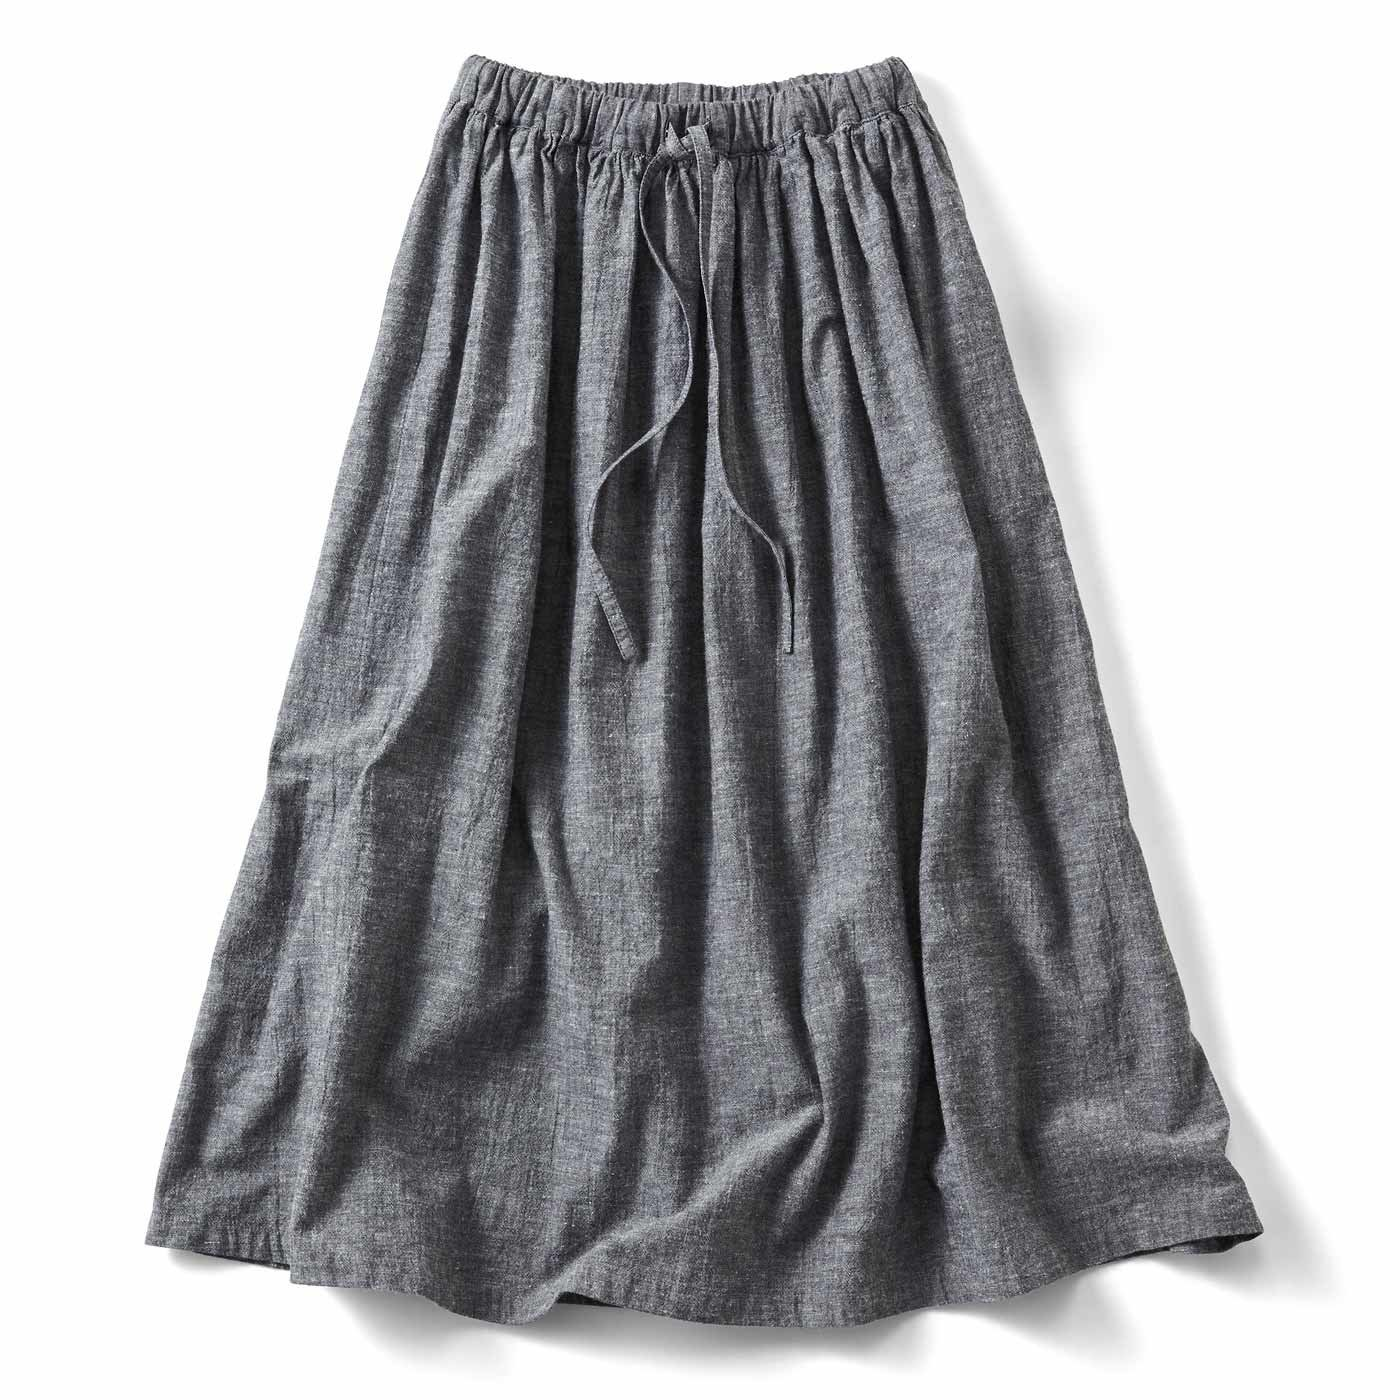 THREE FIFTY STANDARD ラフな麻混のギャザースカート〈ブラック〉